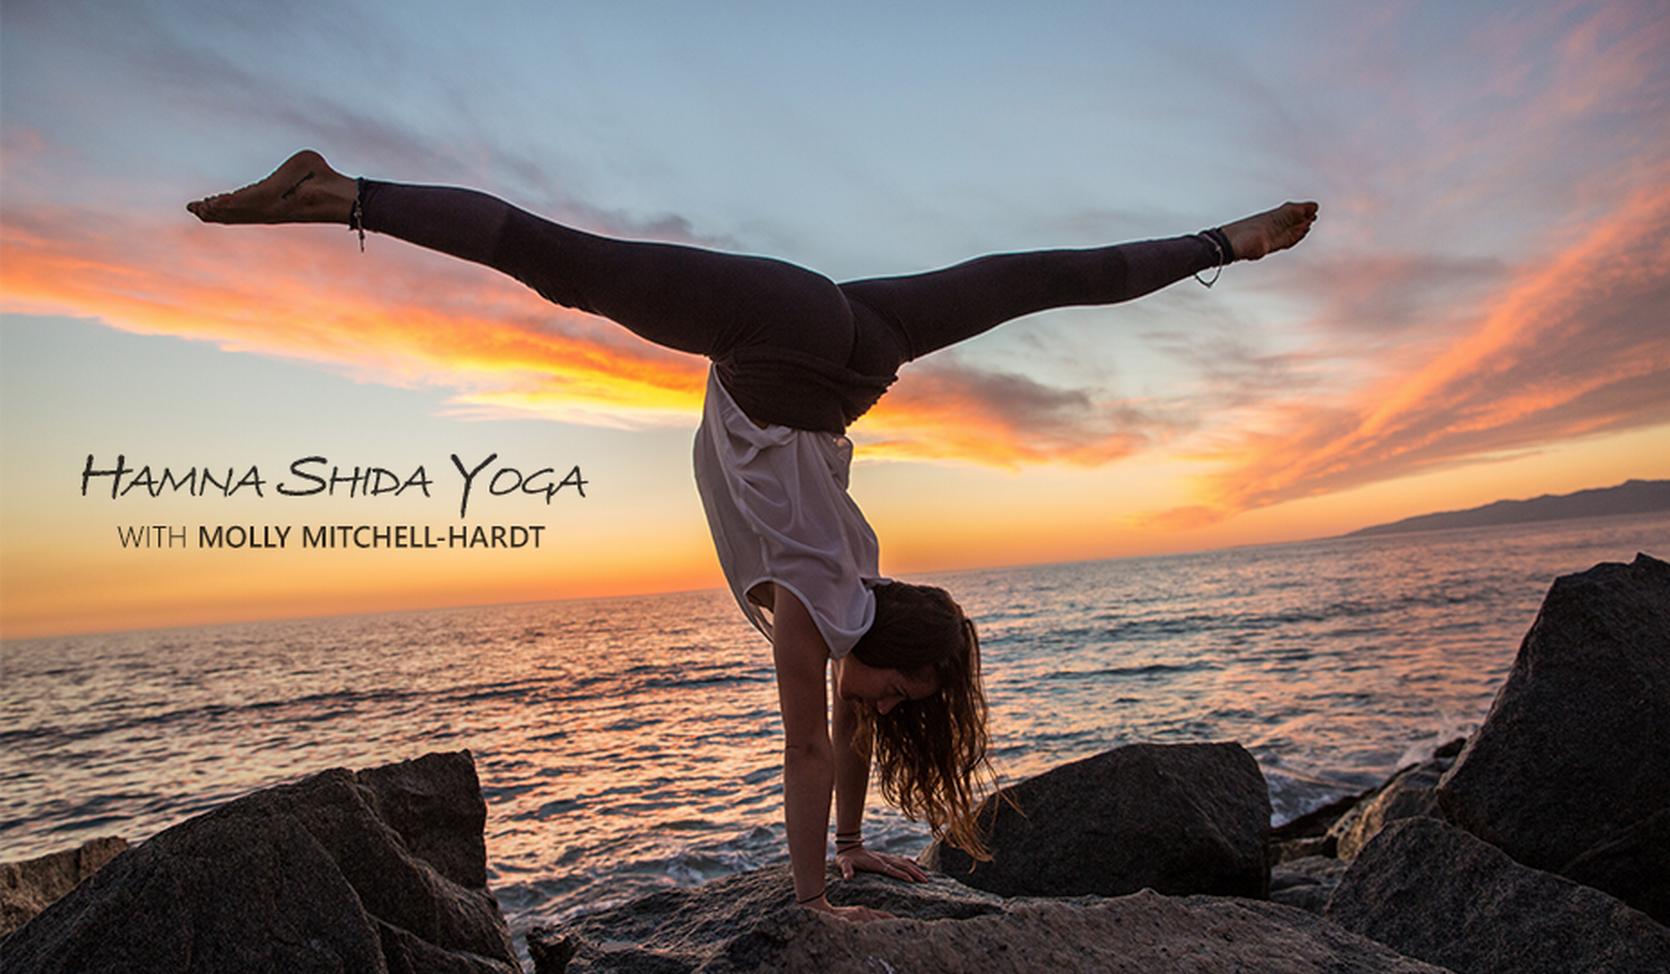 Hamna Shida Yoga